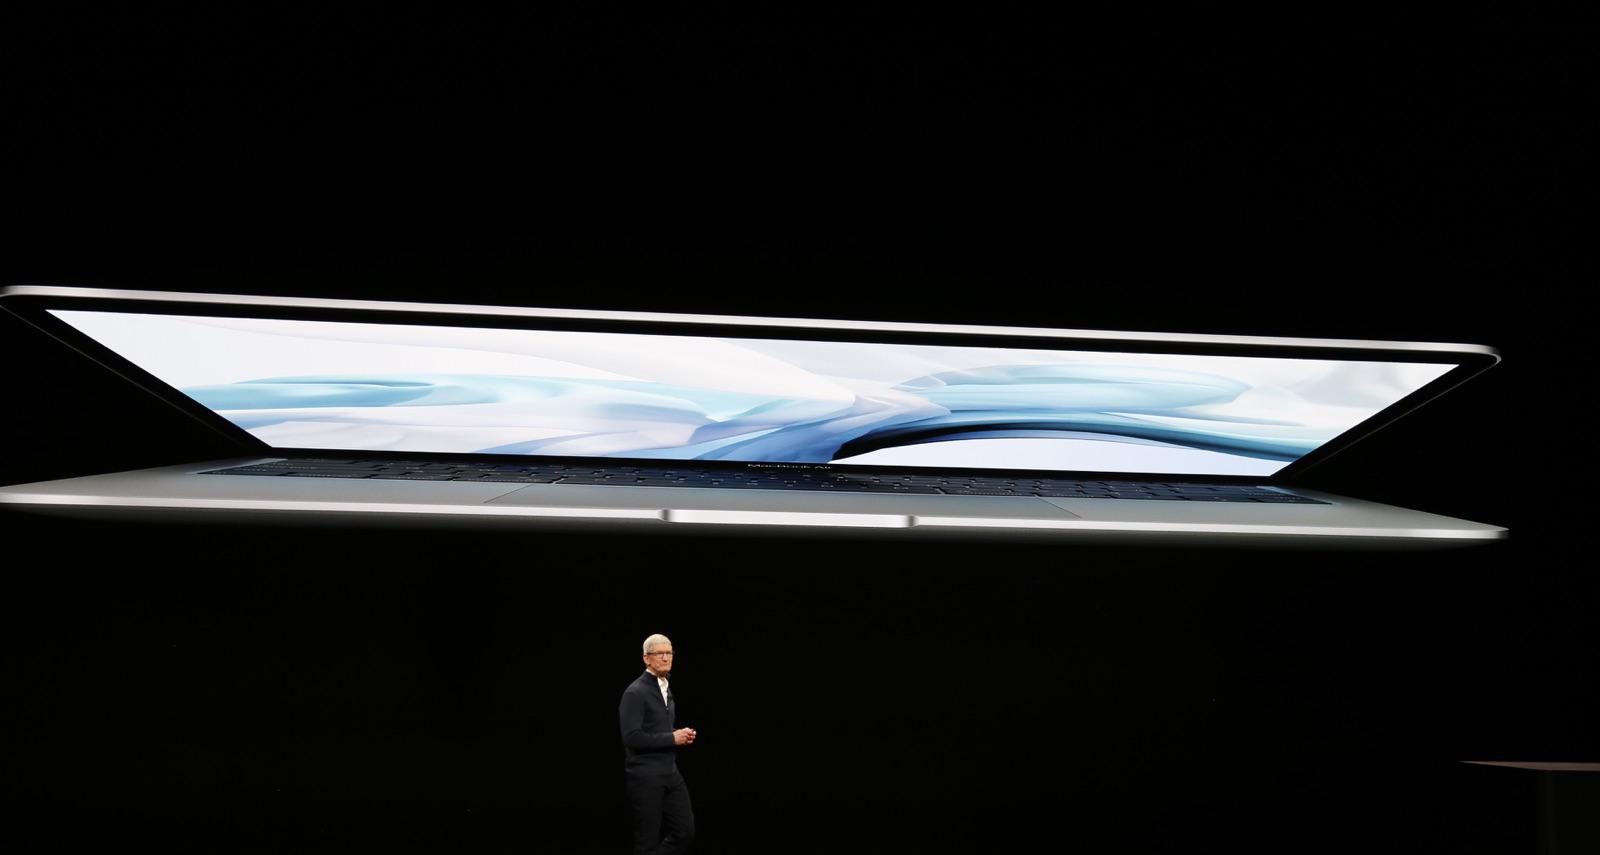 MacBook Air 2018 - مؤتمر آبل: آبل تعلن رسمياً عن الجهاز الجديد MacBook Air ببطارية تدوم 13 ساعة